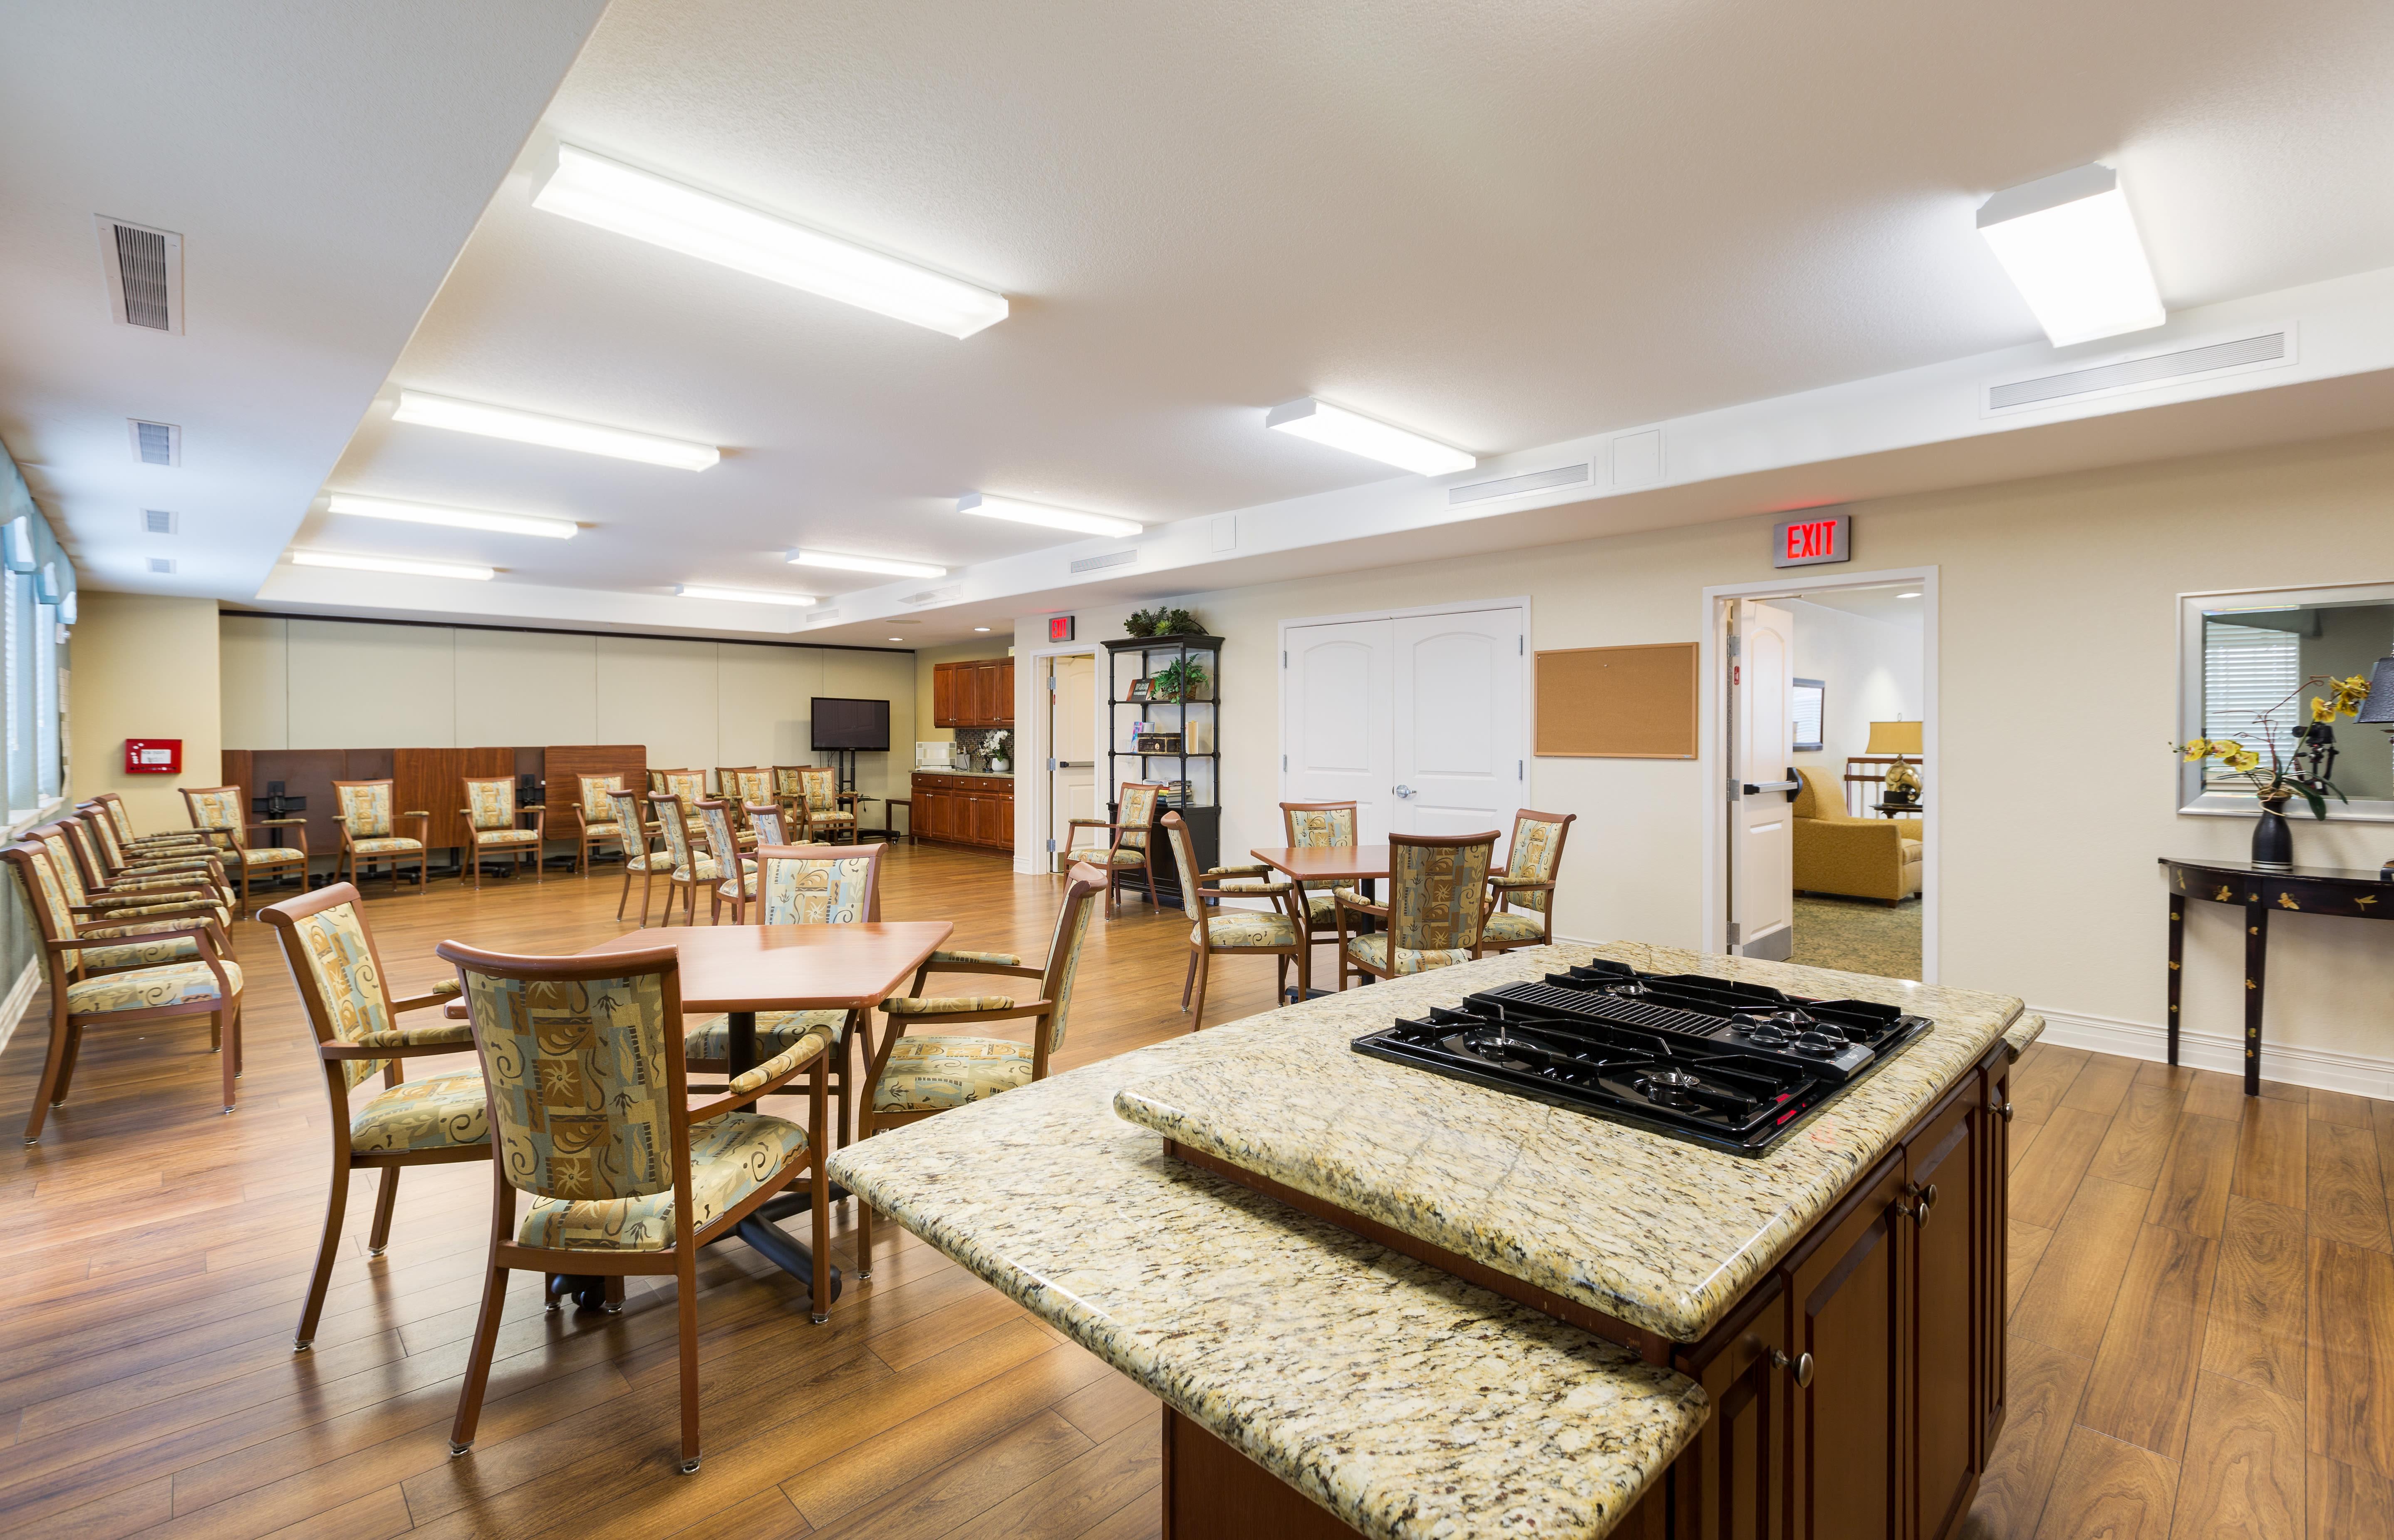 Month-to-Month Rentals at senior living community in Peoria, AZ